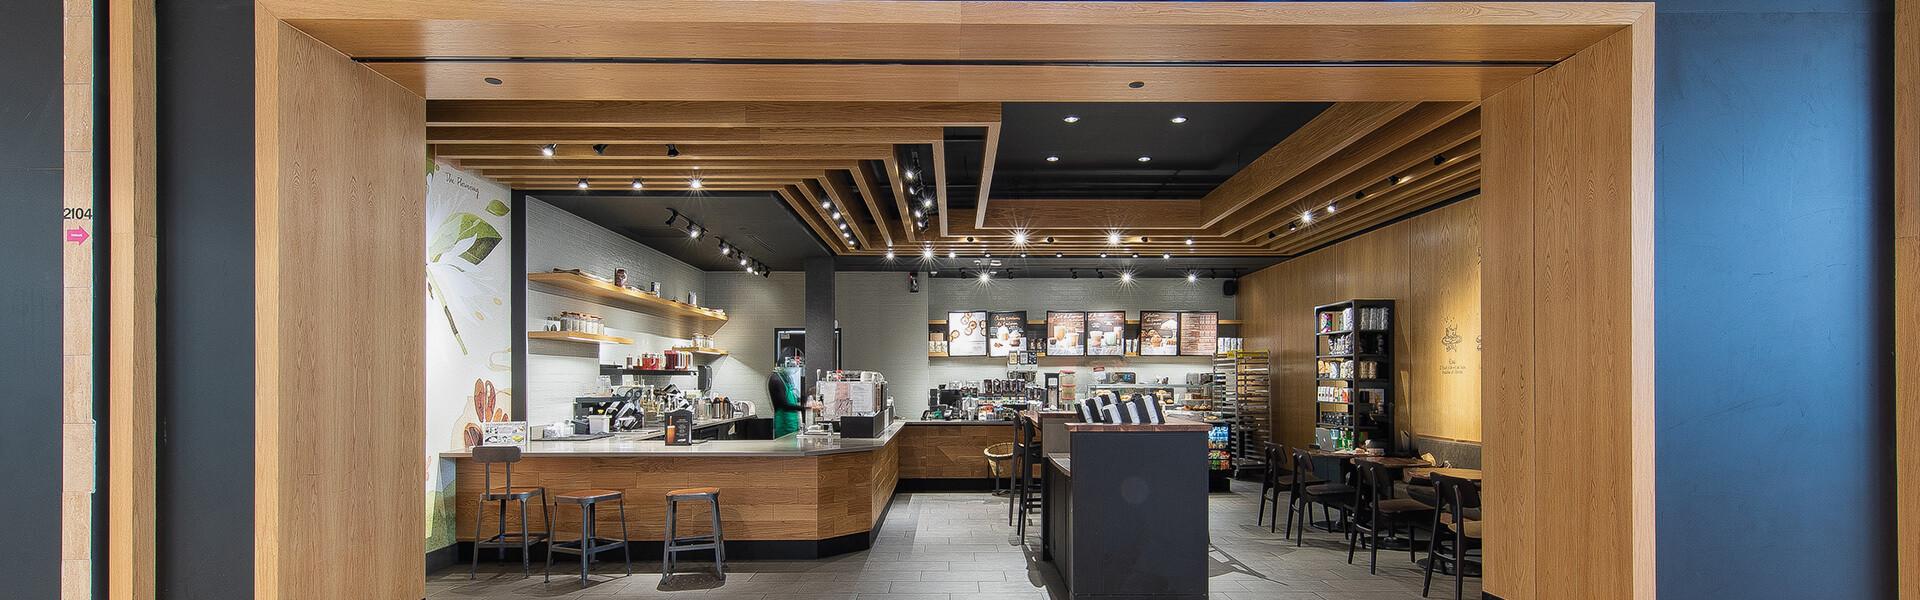 Starbucks - Rockland